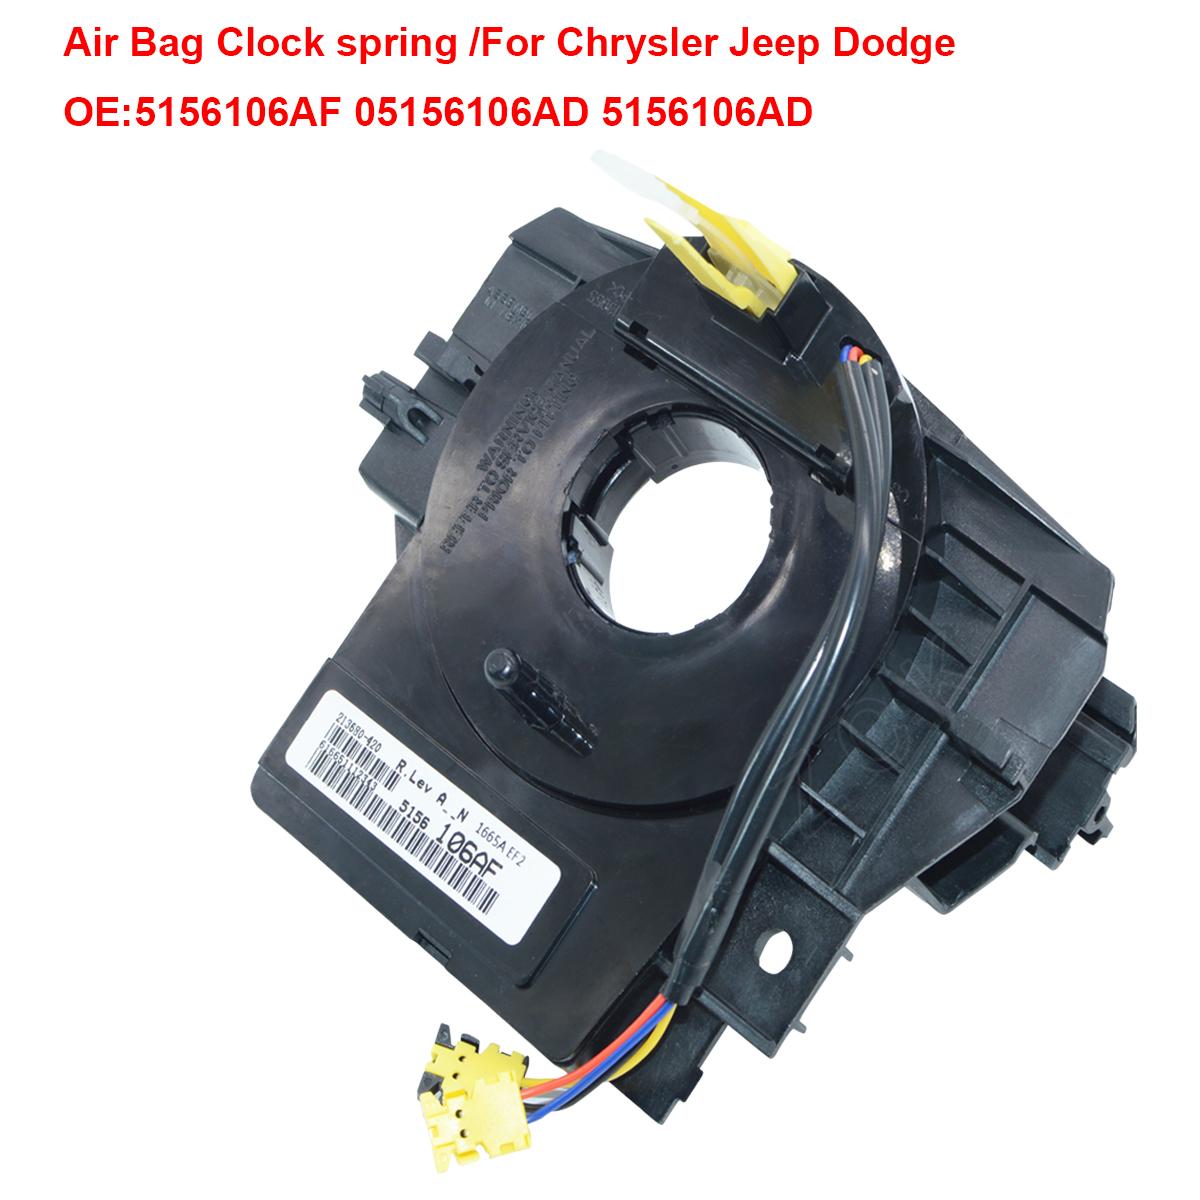 Air Bag Clockspring 5156106af 5156106ad For Jeep Patriot Compass 2008 Wrangler Clock Spring Wiring Schematic Chrysler Dodge